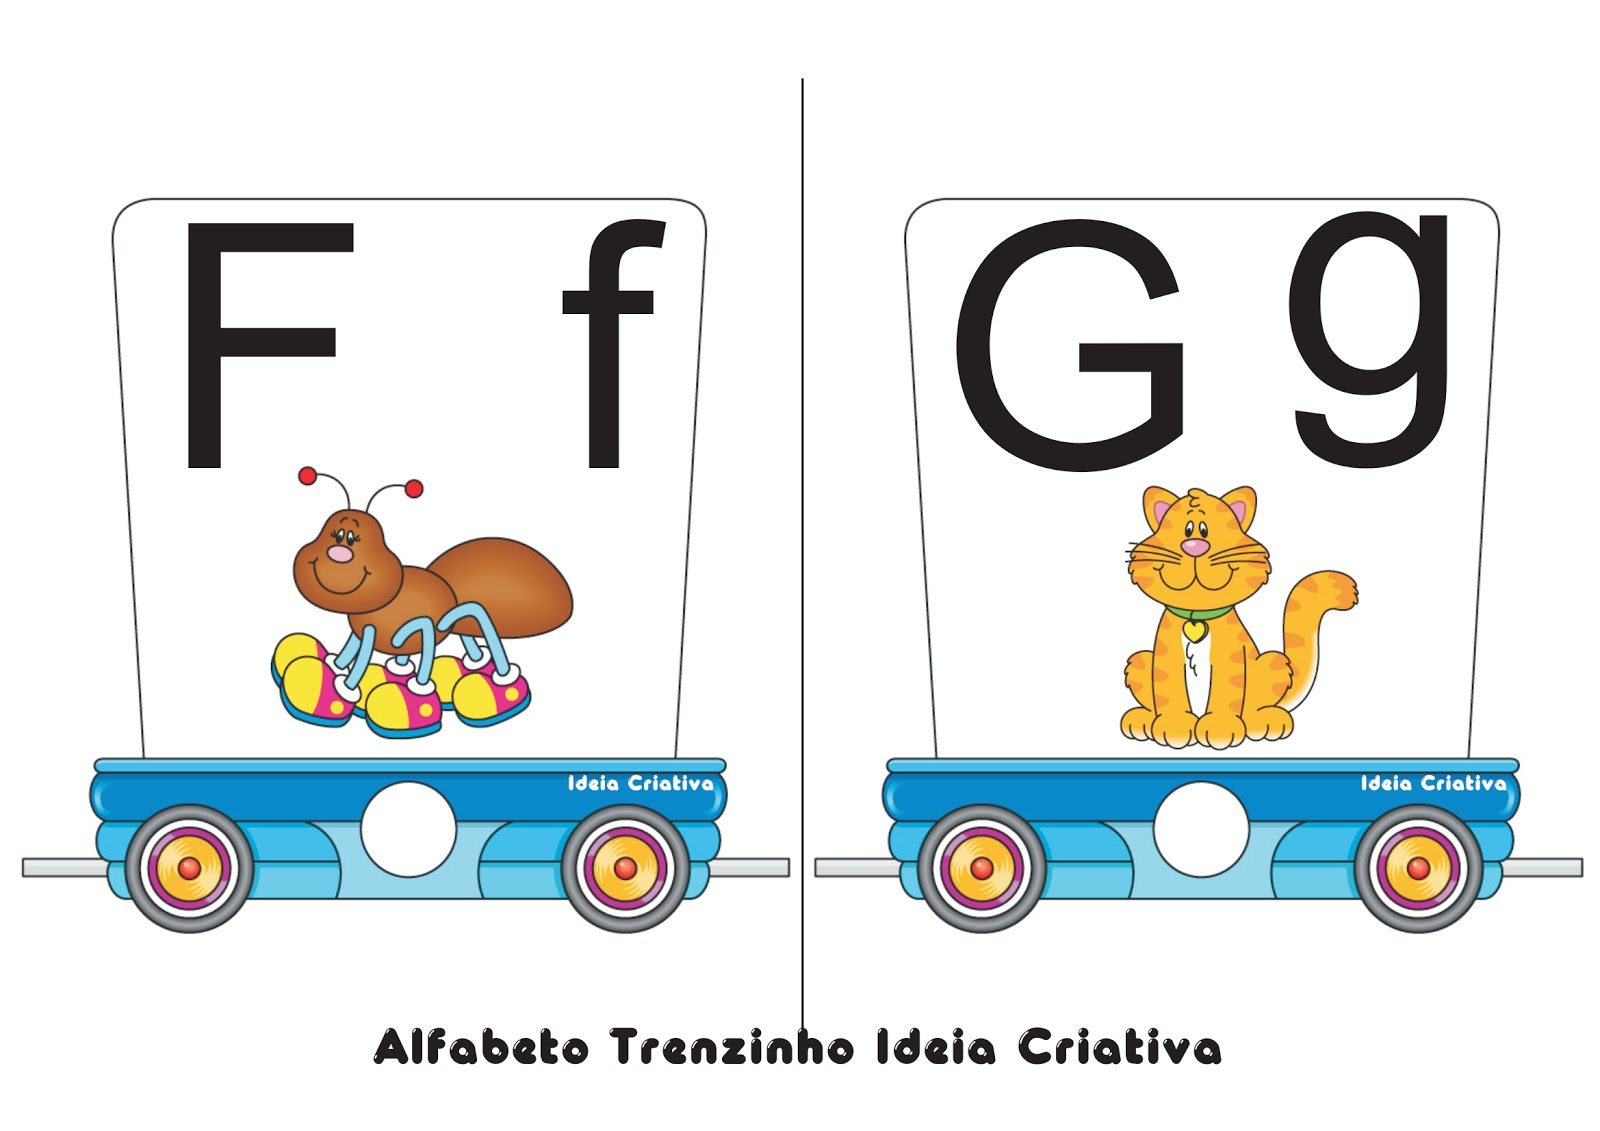 Alfabeto Trenzinho Ideia Criativa